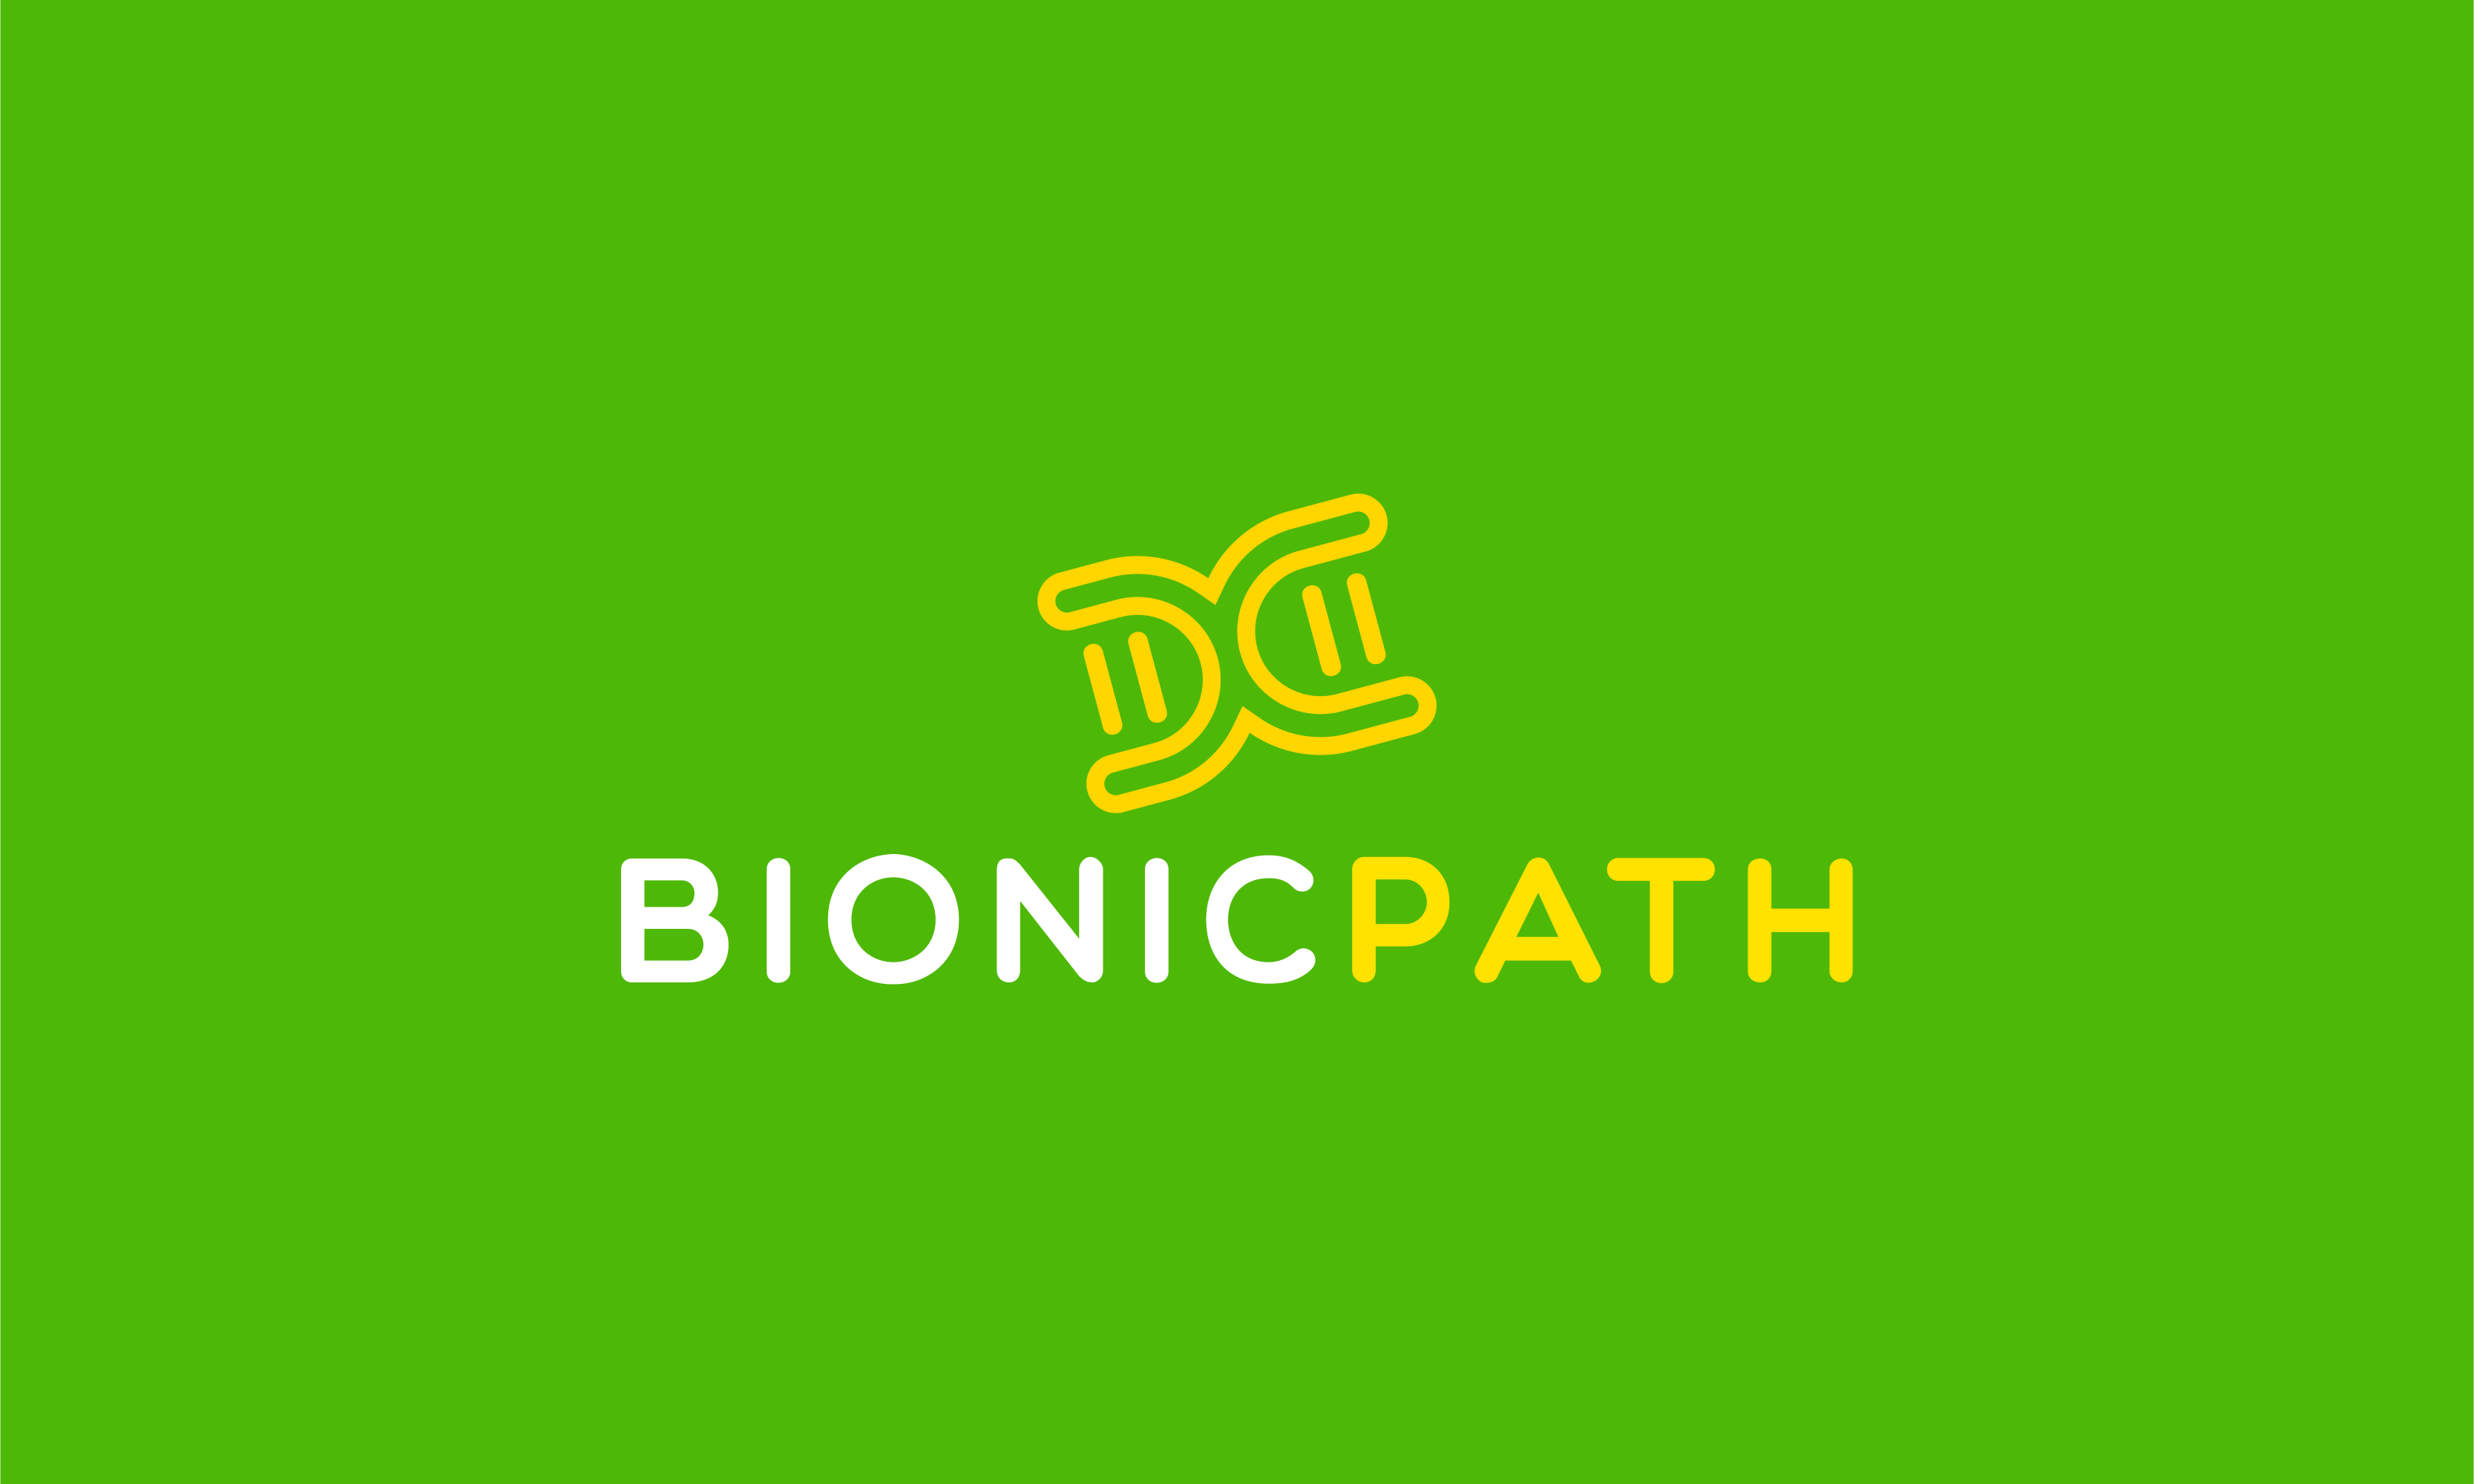 Bionicpath